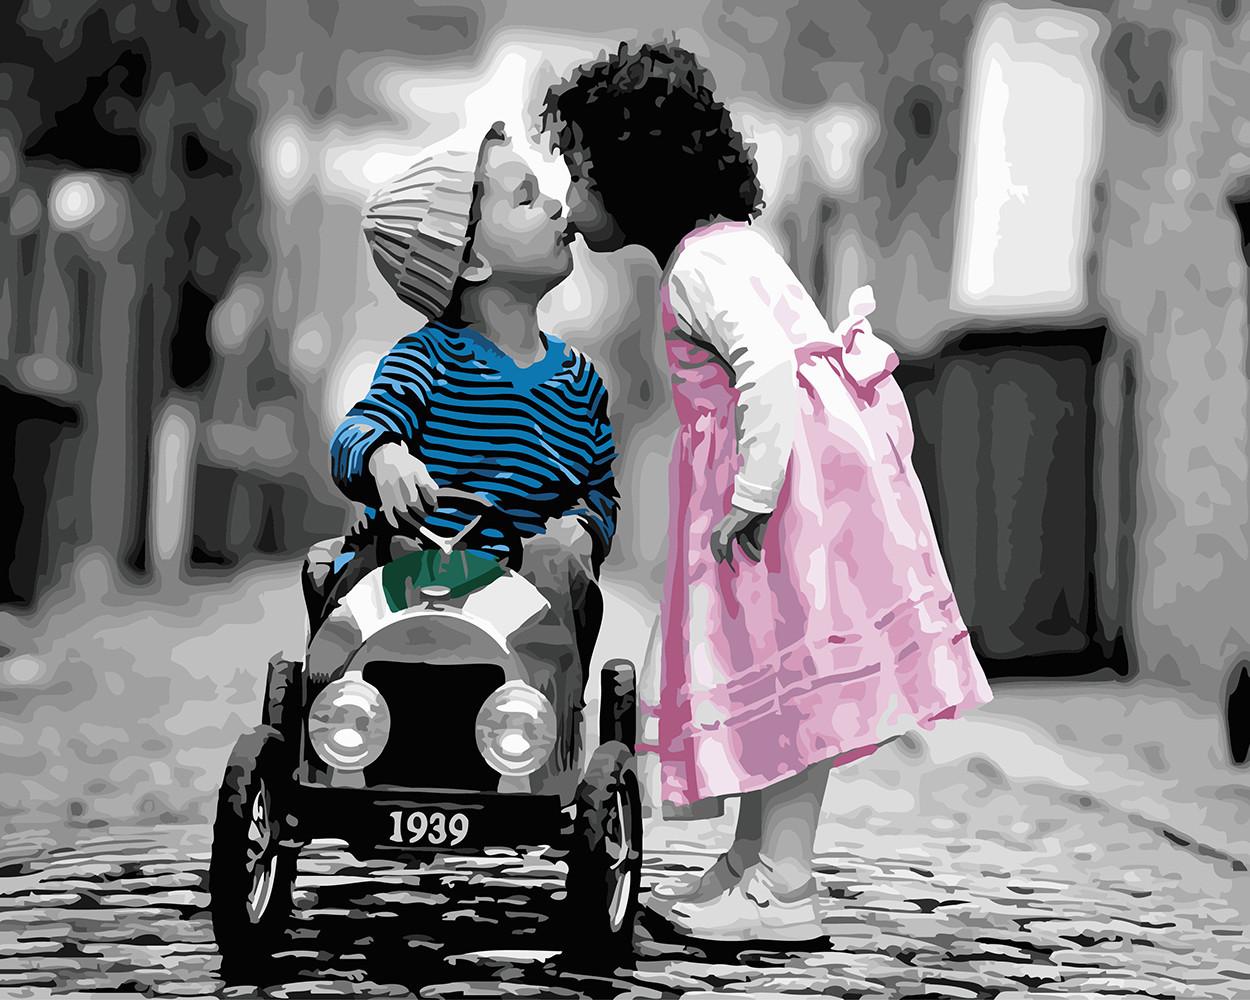 Картина по номерам Первый поцелуй 40 х 50 см (BRM22639)